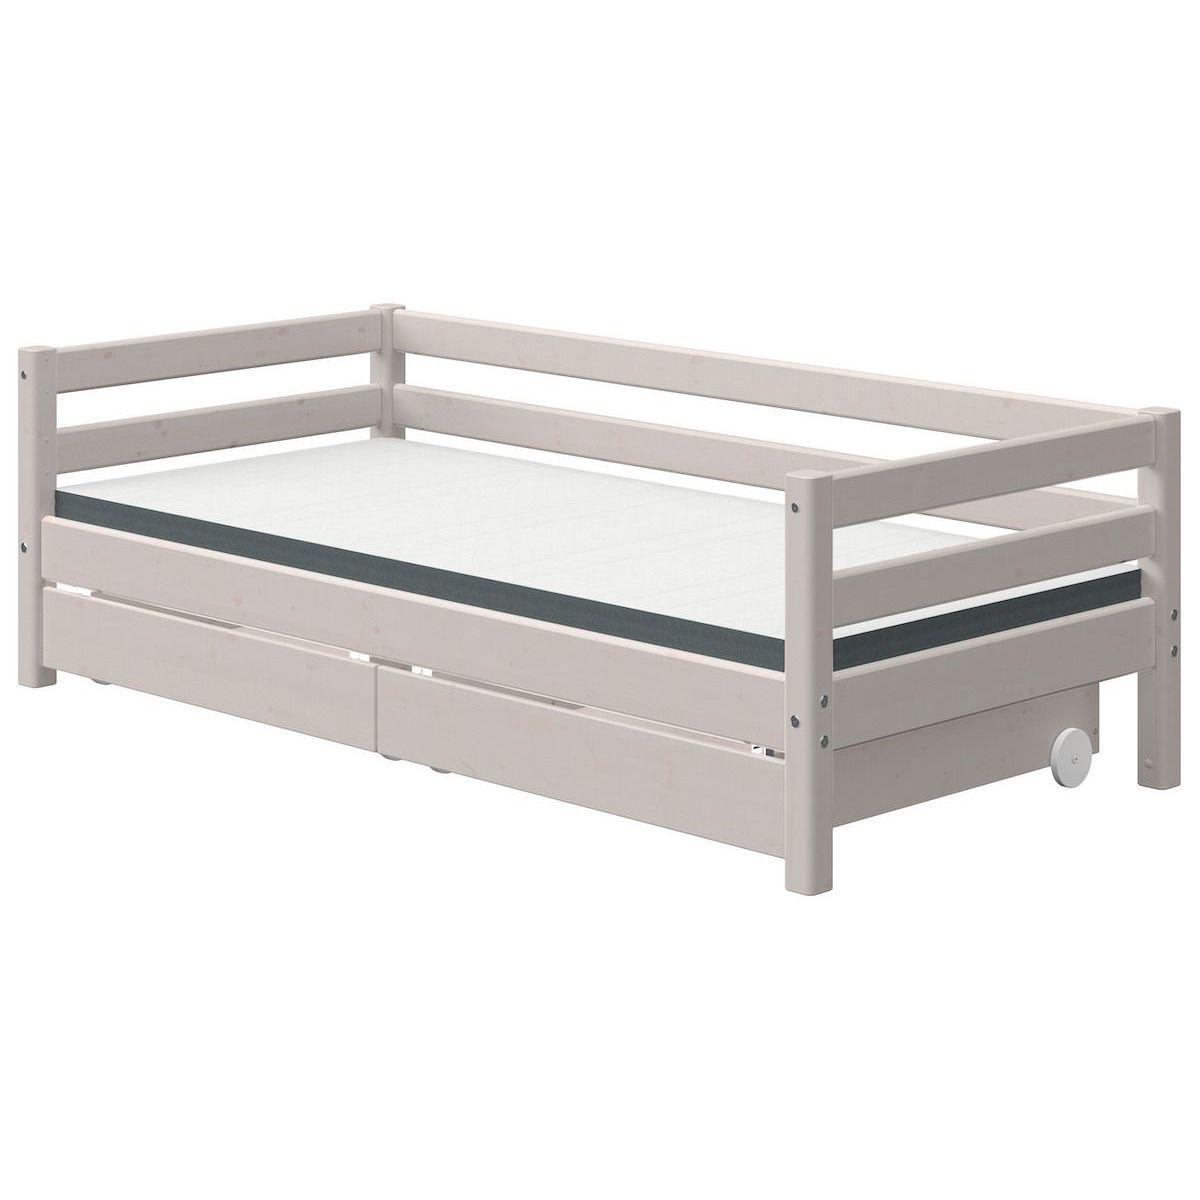 Tagesbett 90x200cm 2 Schubladen CLASSIC Flexa grey washed